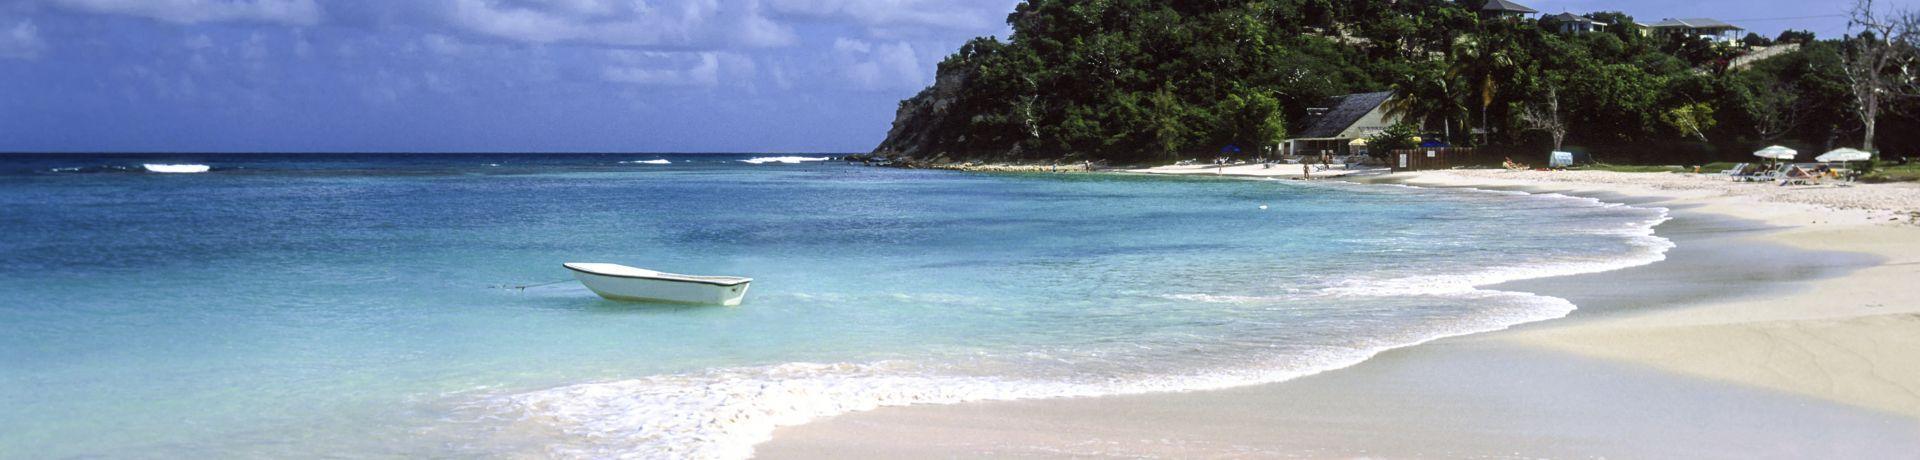 region-id-174-antigua-barbuda-antigua-barbuda_TS_180032211_F1920x460.jpg